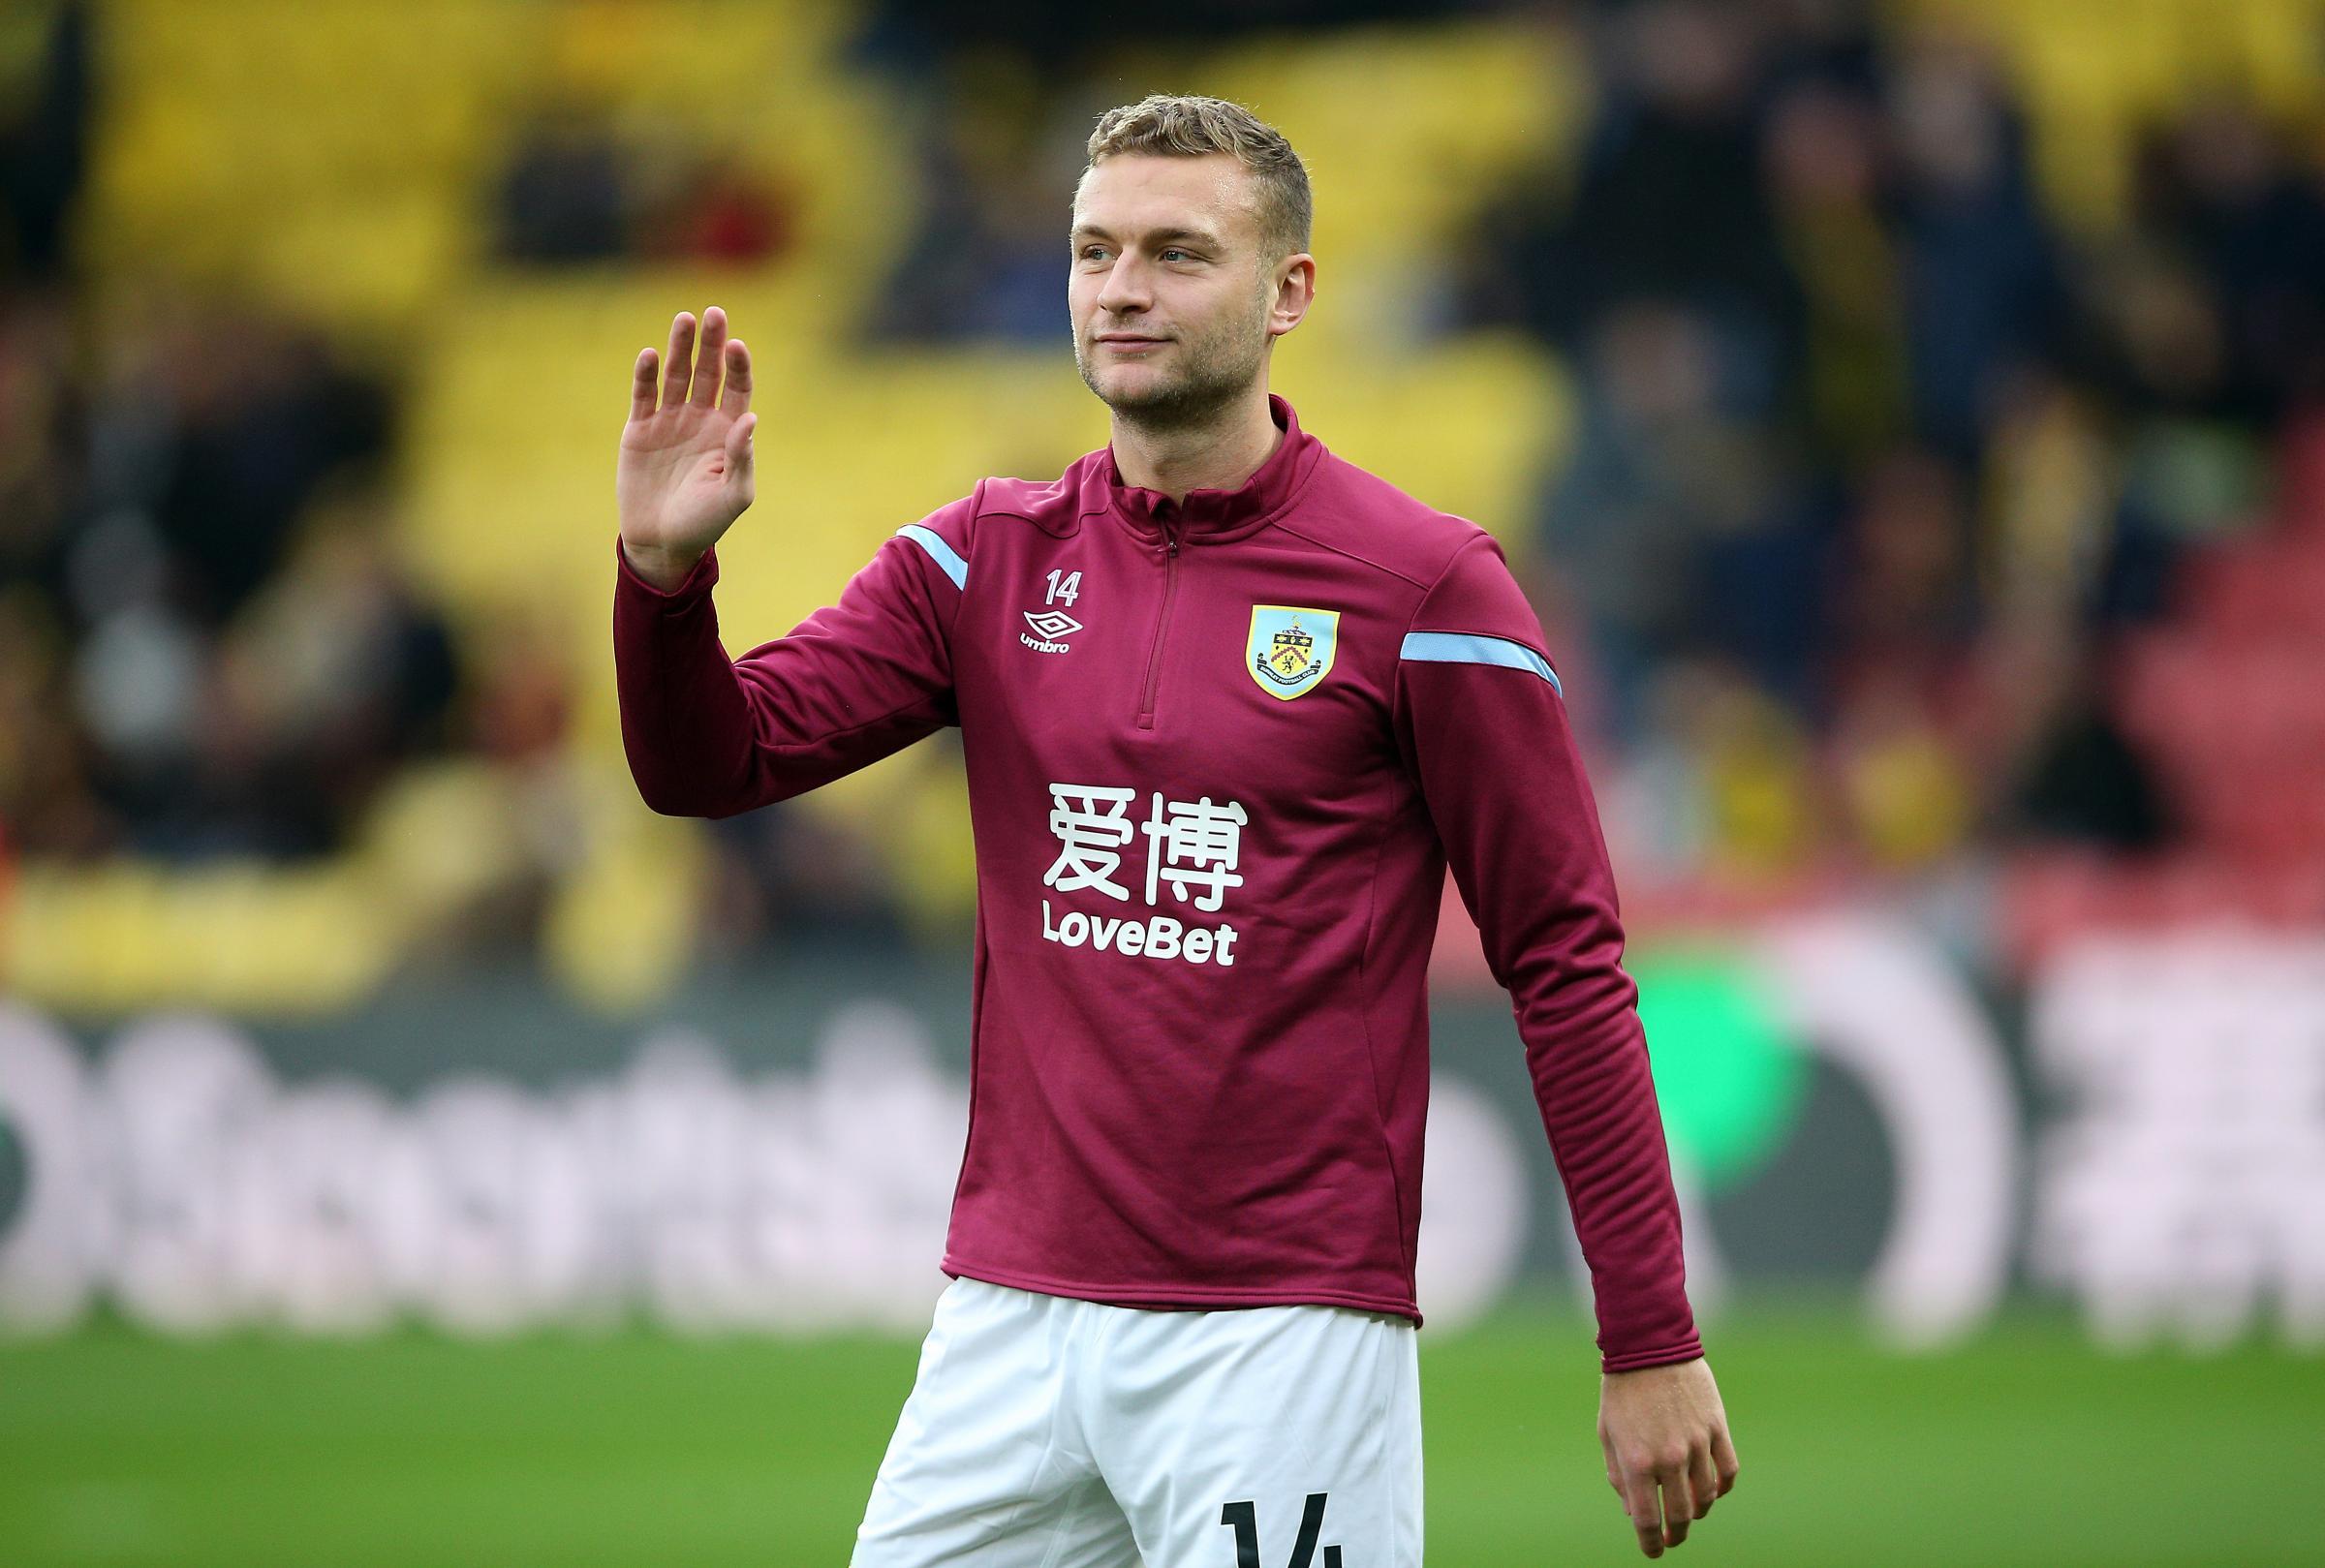 Sean Dyche reiterates Burnley's stance on Ben Gibson